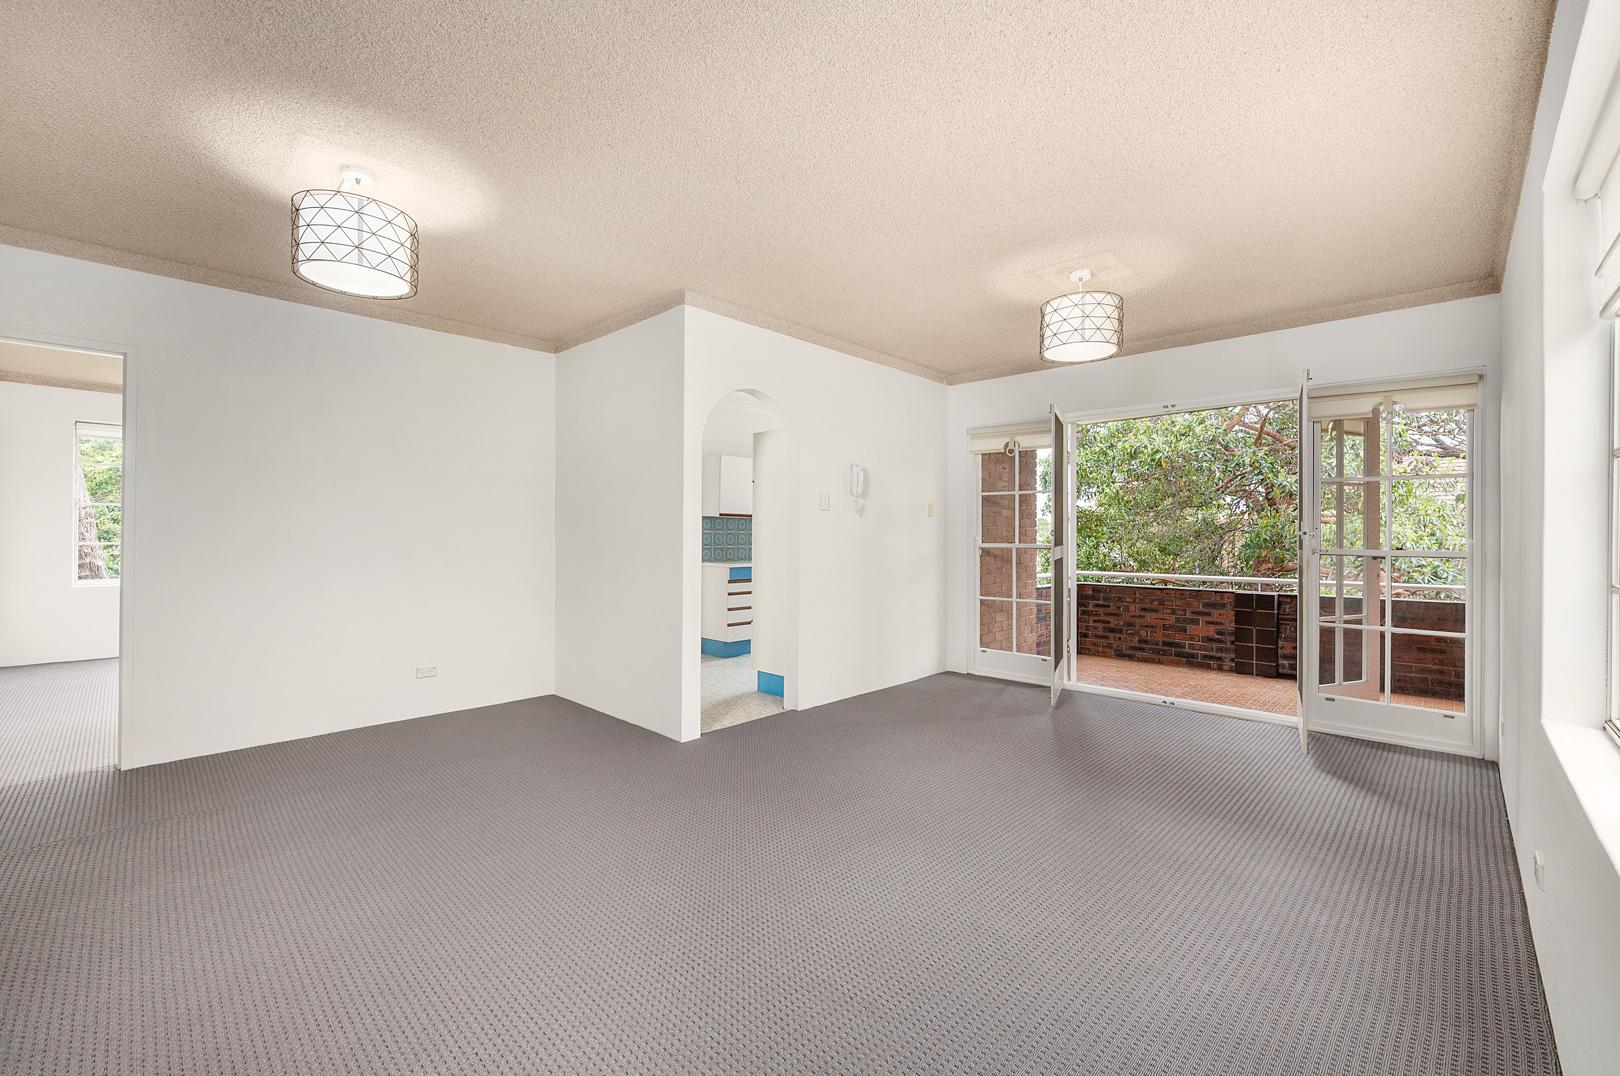 5/6-8 Gower Street, Summer Hill, NSW, 2130 - Image 1